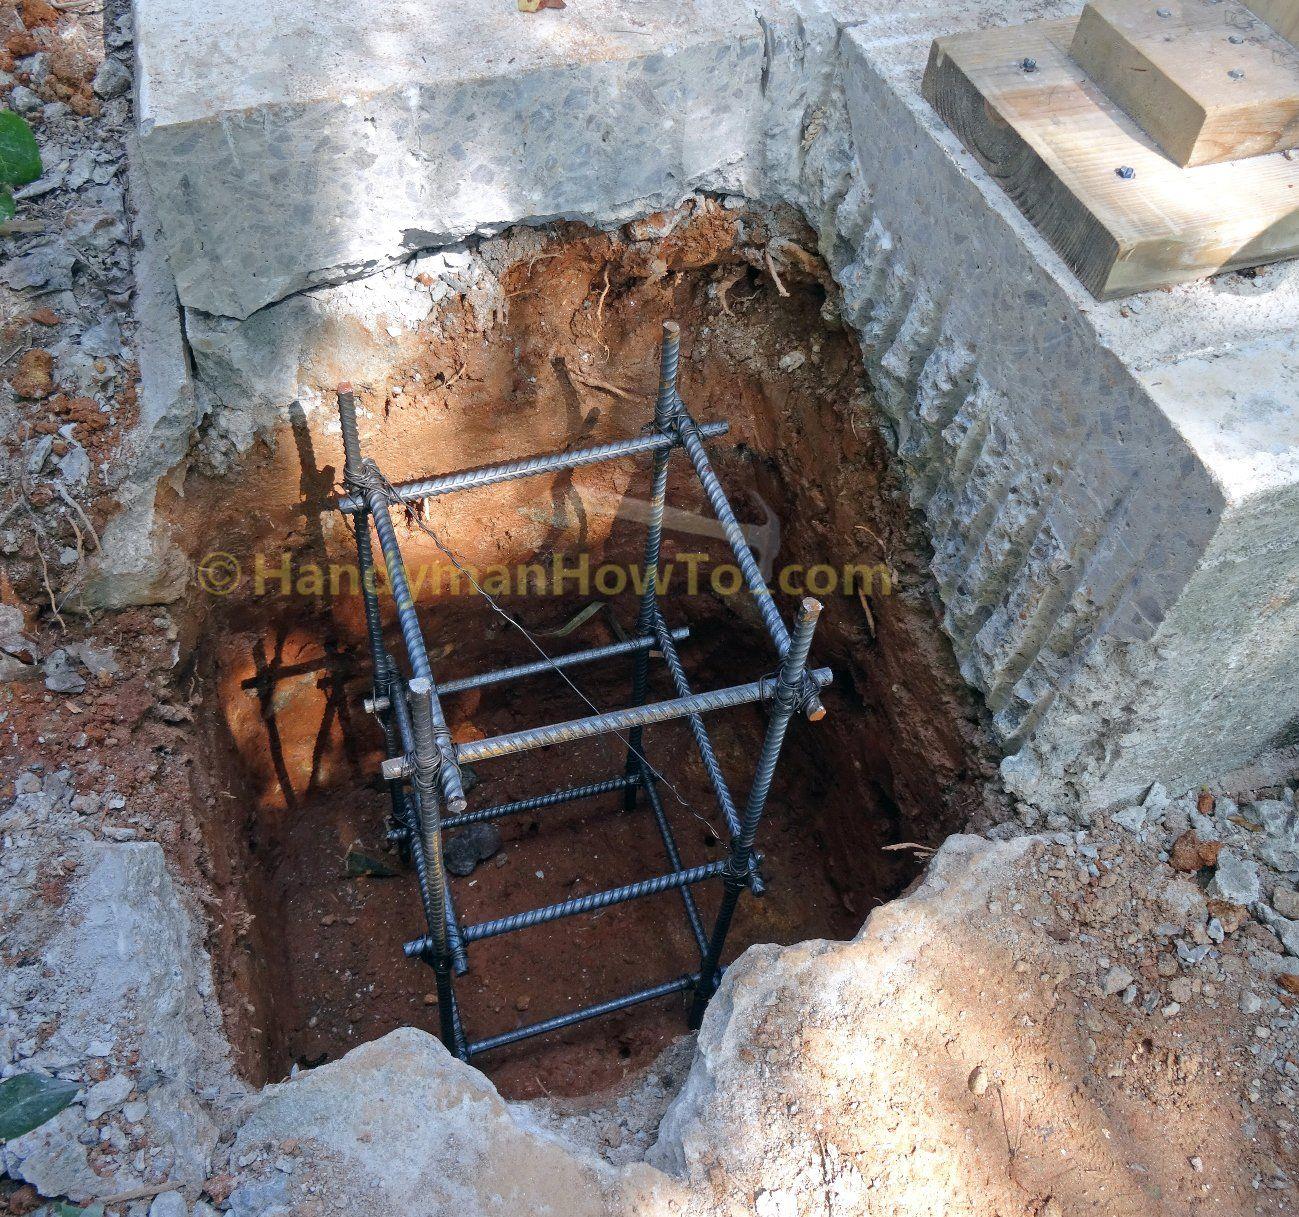 Concrete Rebar Cage In Deck Post Footer Concrete Slab Concrete Deck Posts